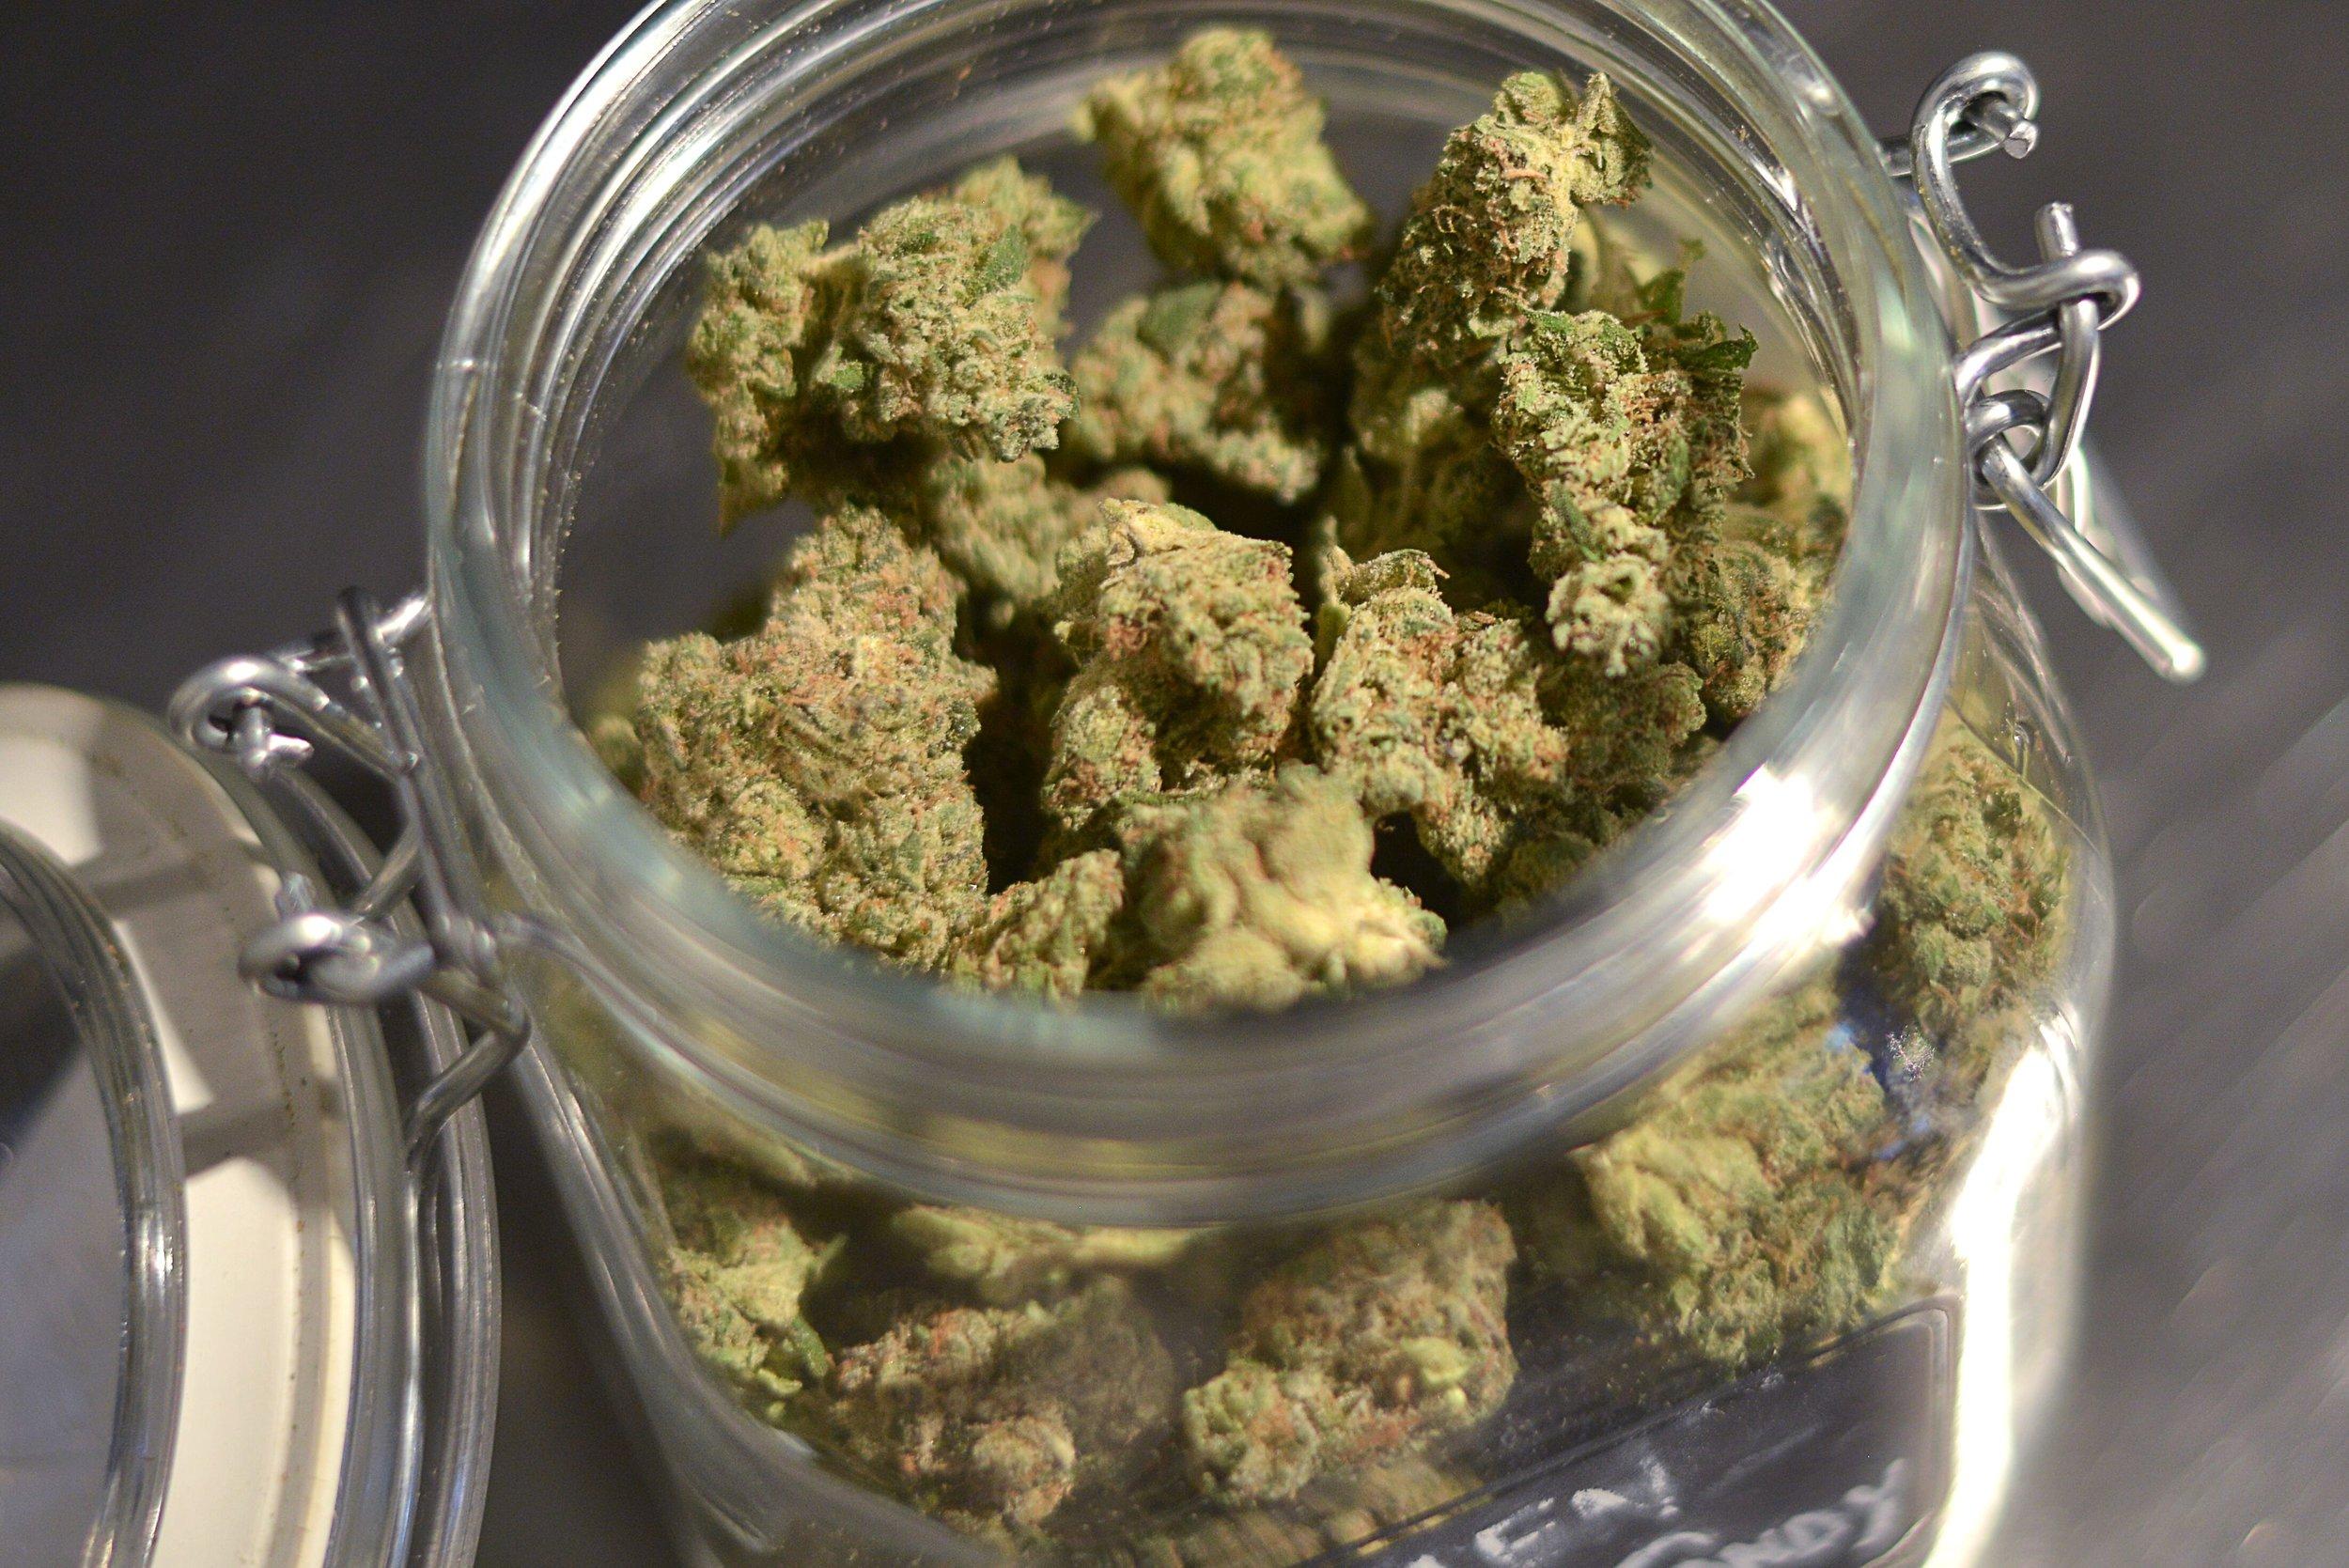 marijuana.jpeg